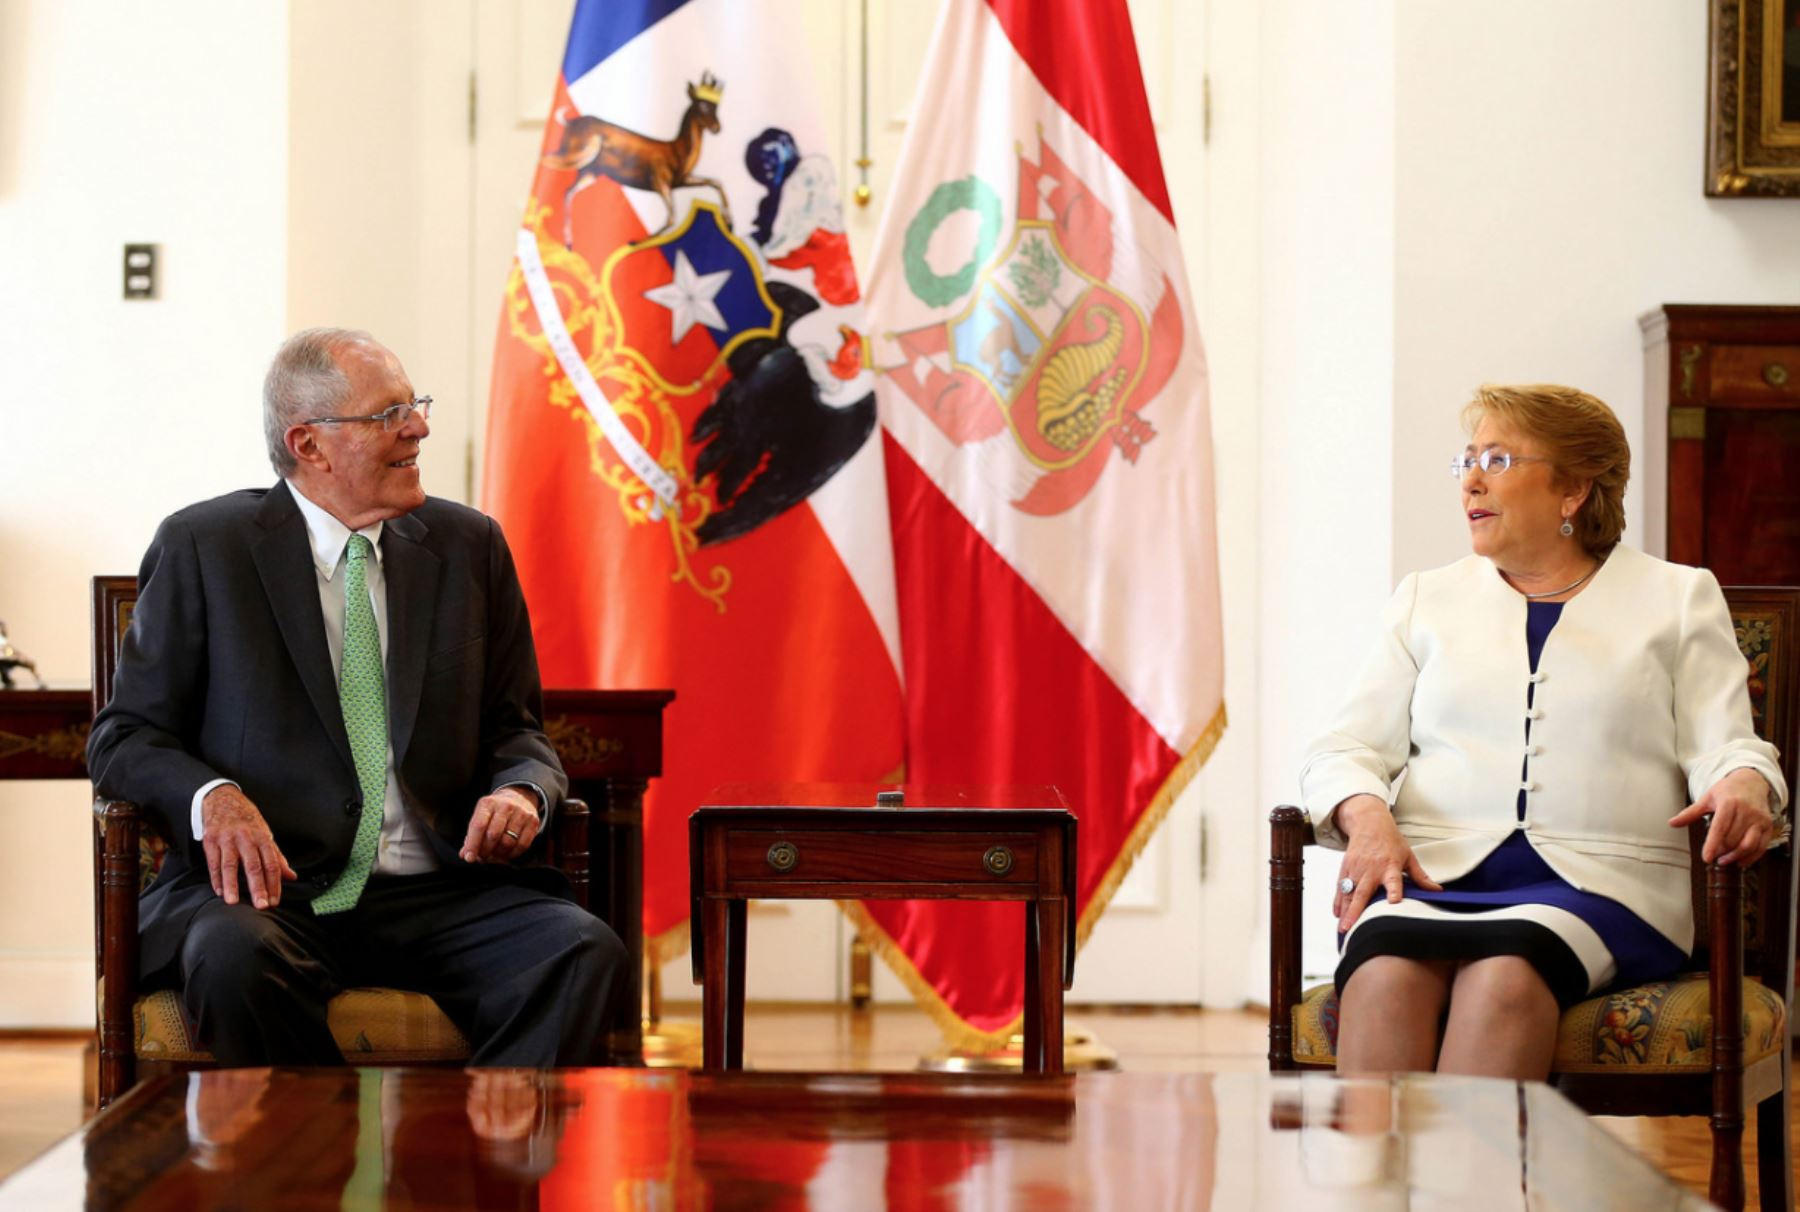 El jefe del Estado peruano, Pedro Pablo Kuczynski, se reúne con la presidenta de Chile, Michelle Bachelet en el Palacio de la Moneda. Foto:ANDINA/ Prensa Presidencia